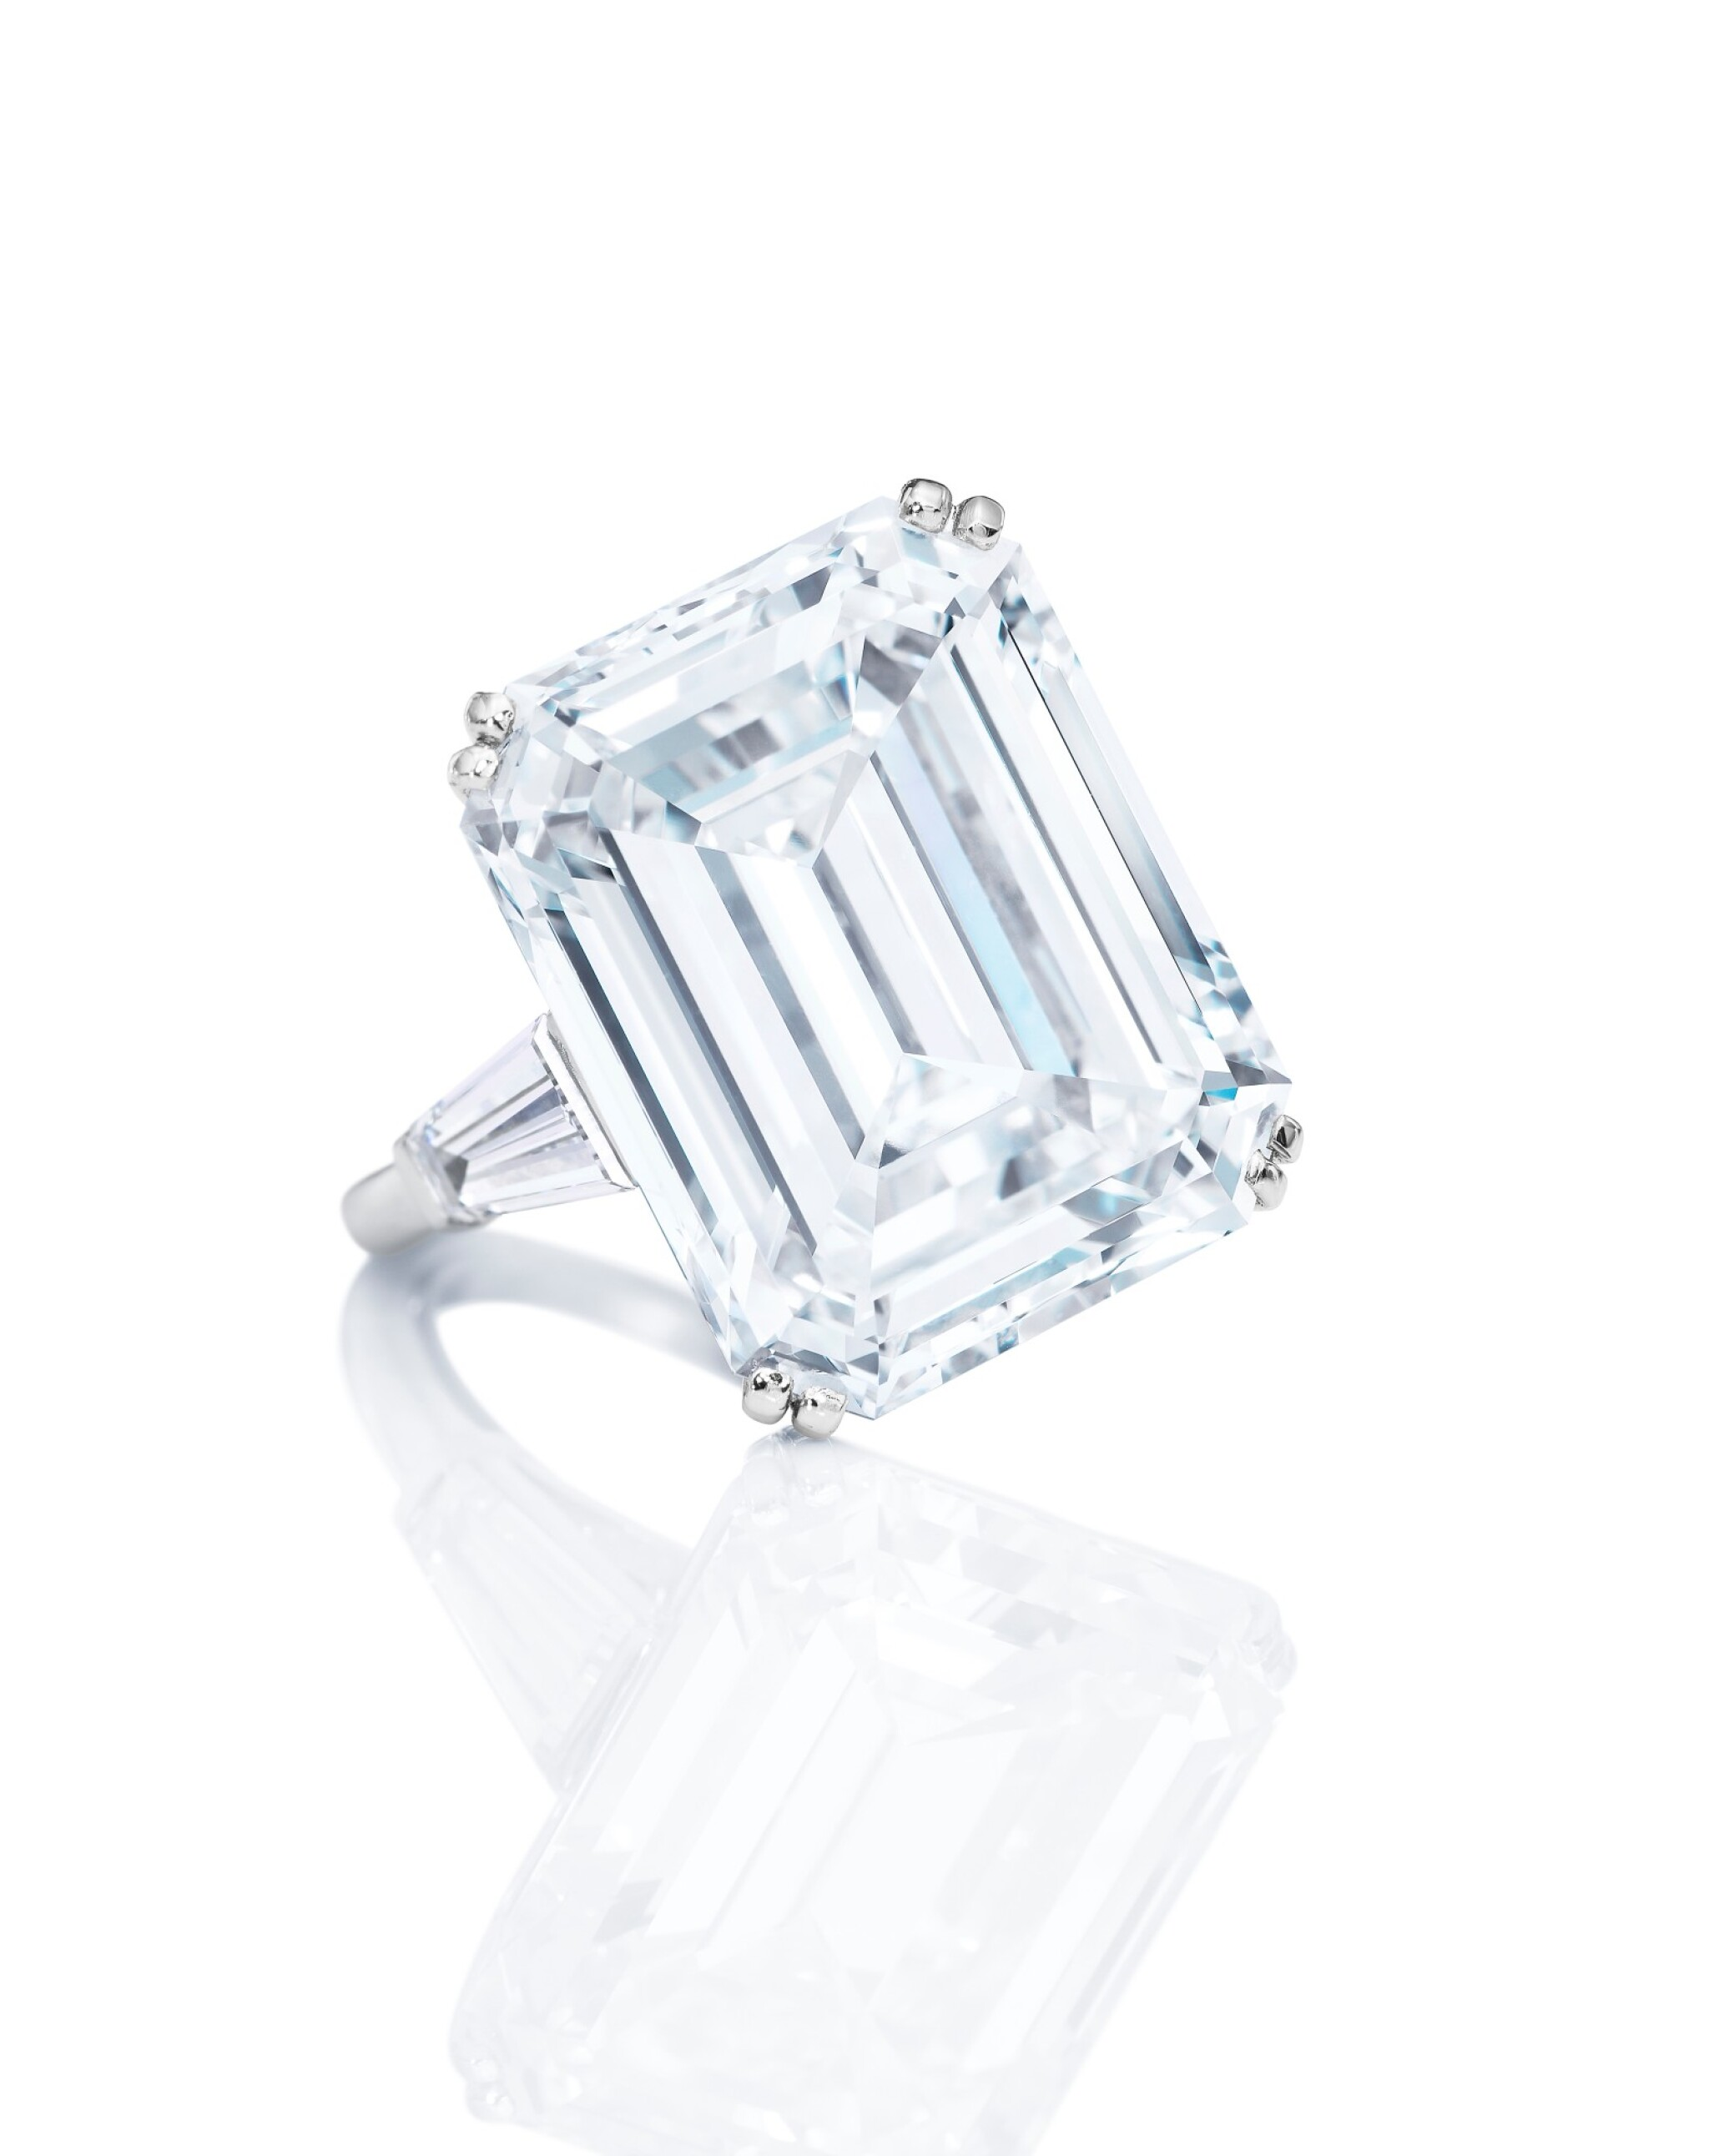 View full screen - View 1 of Lot 1638. AN IMPRESSIVE DIAMOND RING, MOUNT BY VAN CLEEF & ARPELS | 非常壯觀 16.38卡拉 方形 D色 全美無瑕(FL)Type IIa 鑽石戒指, 梵克雅寶戒台.